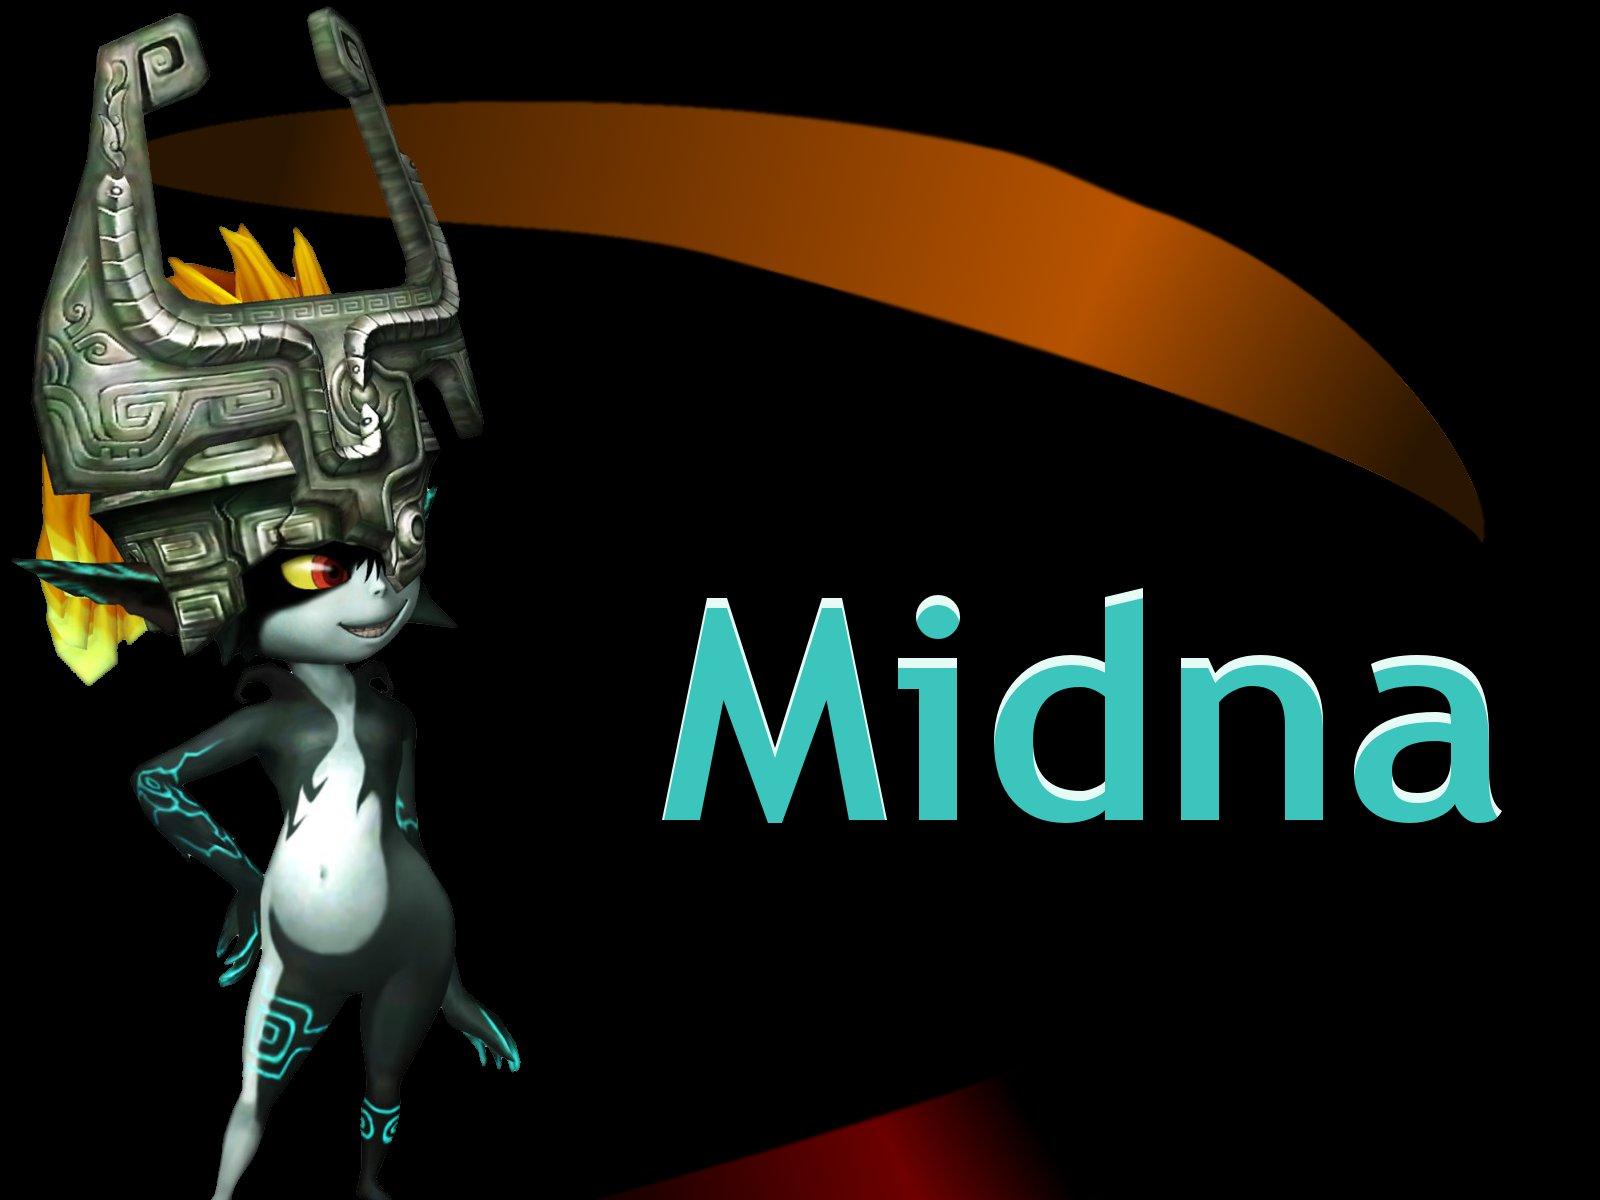 Zelda Twilight Princess Midna Midna is by far my favorite